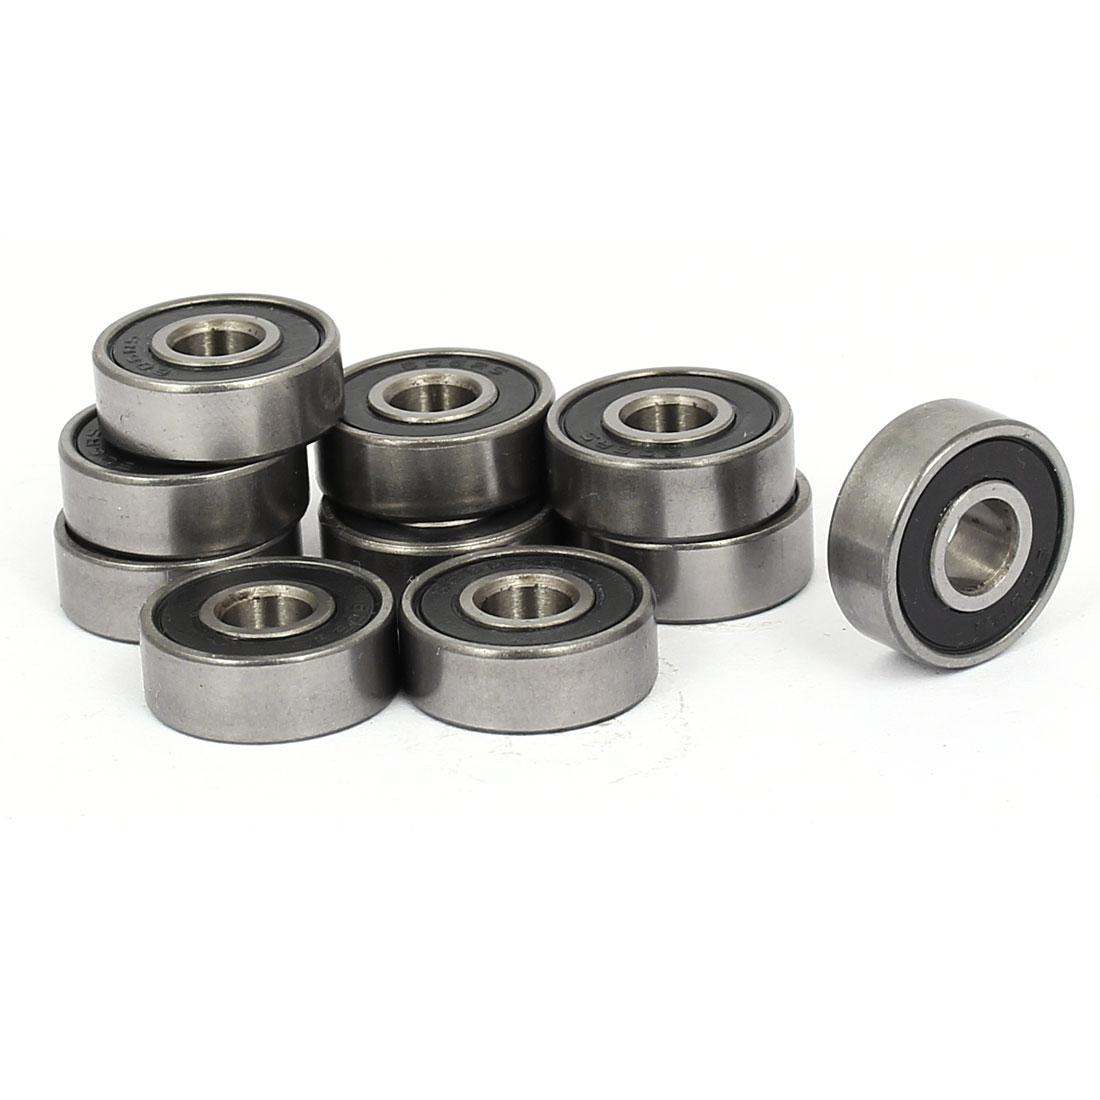 6mmx17mmx6mm Seal Deep Groove Rolling Ball Bearings 606RS 10pcs